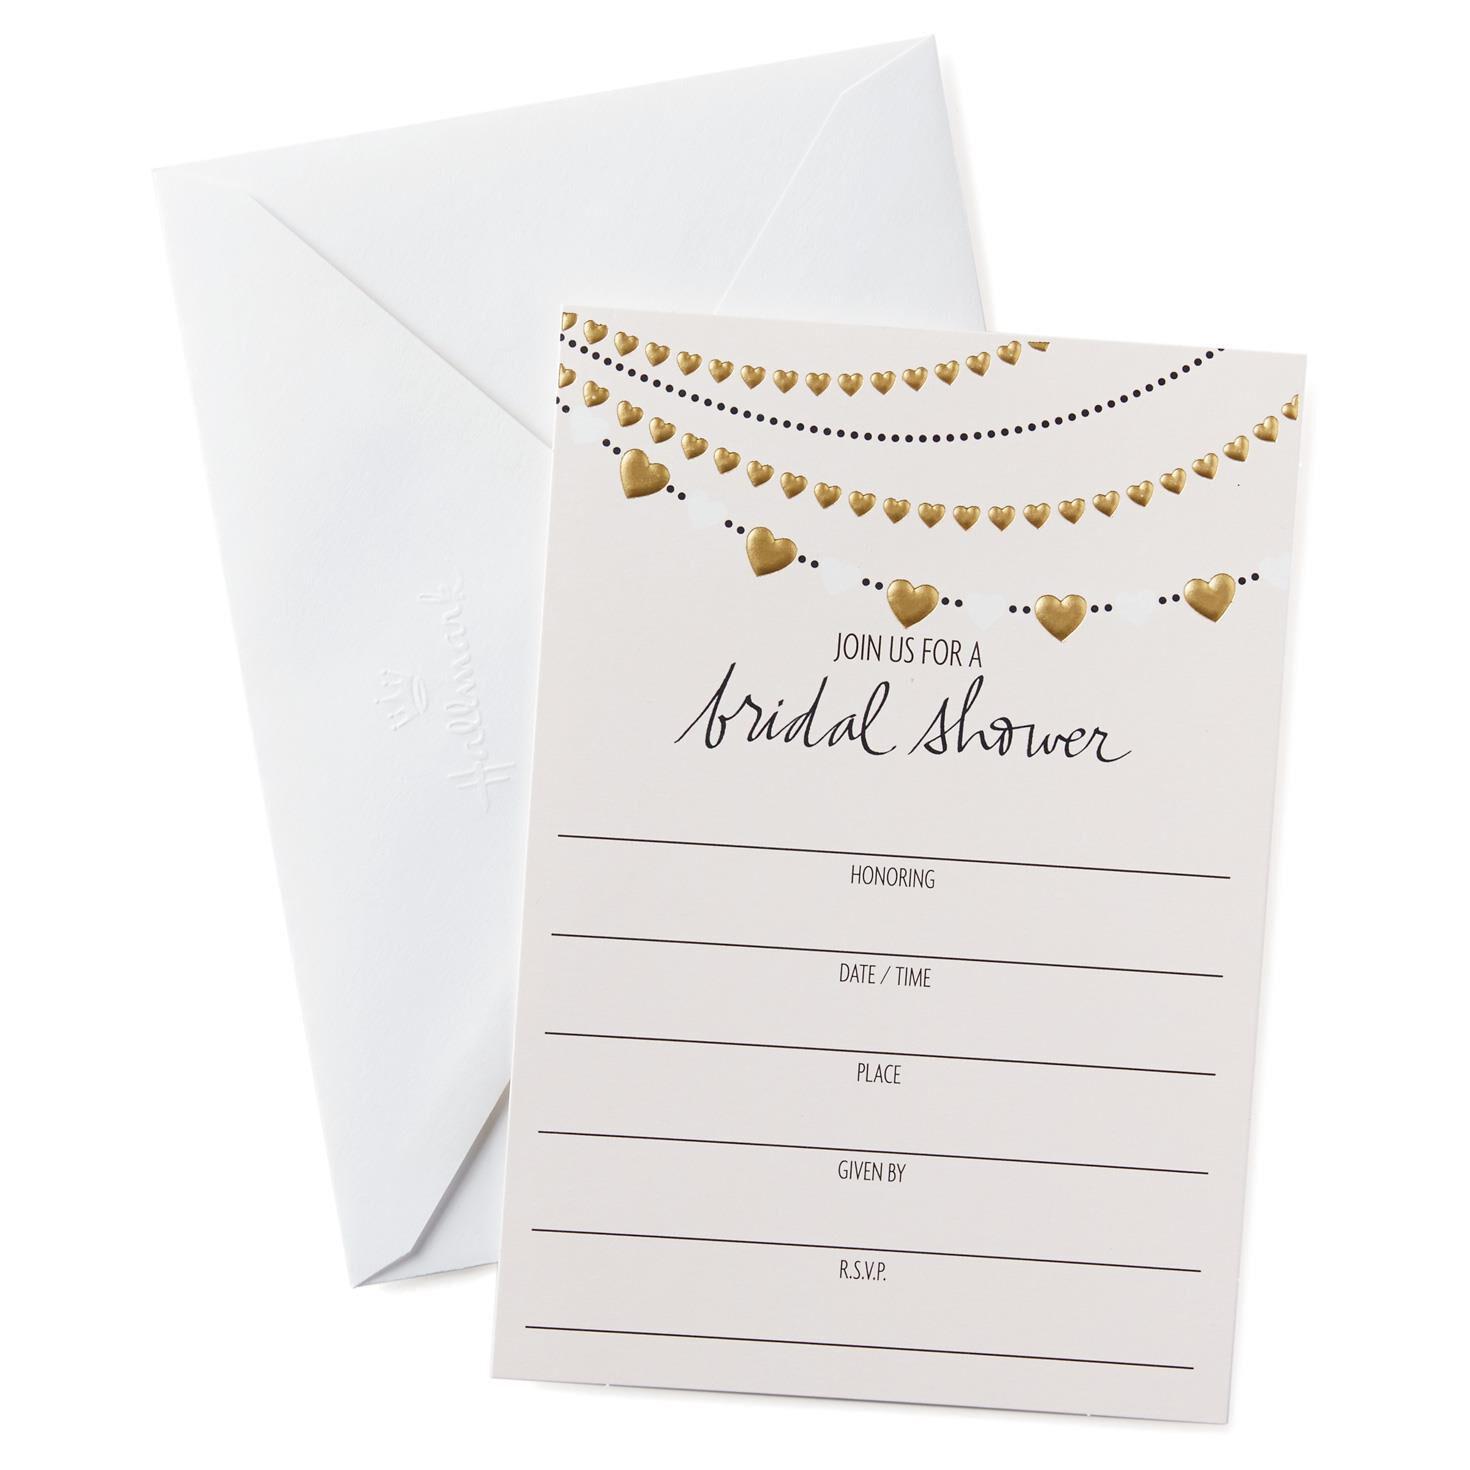 hallmark wedding invitations 16 Papyrus Wedding Invitations 16 Papyrus Wedding Invitations papyrus wedding invitations reviews